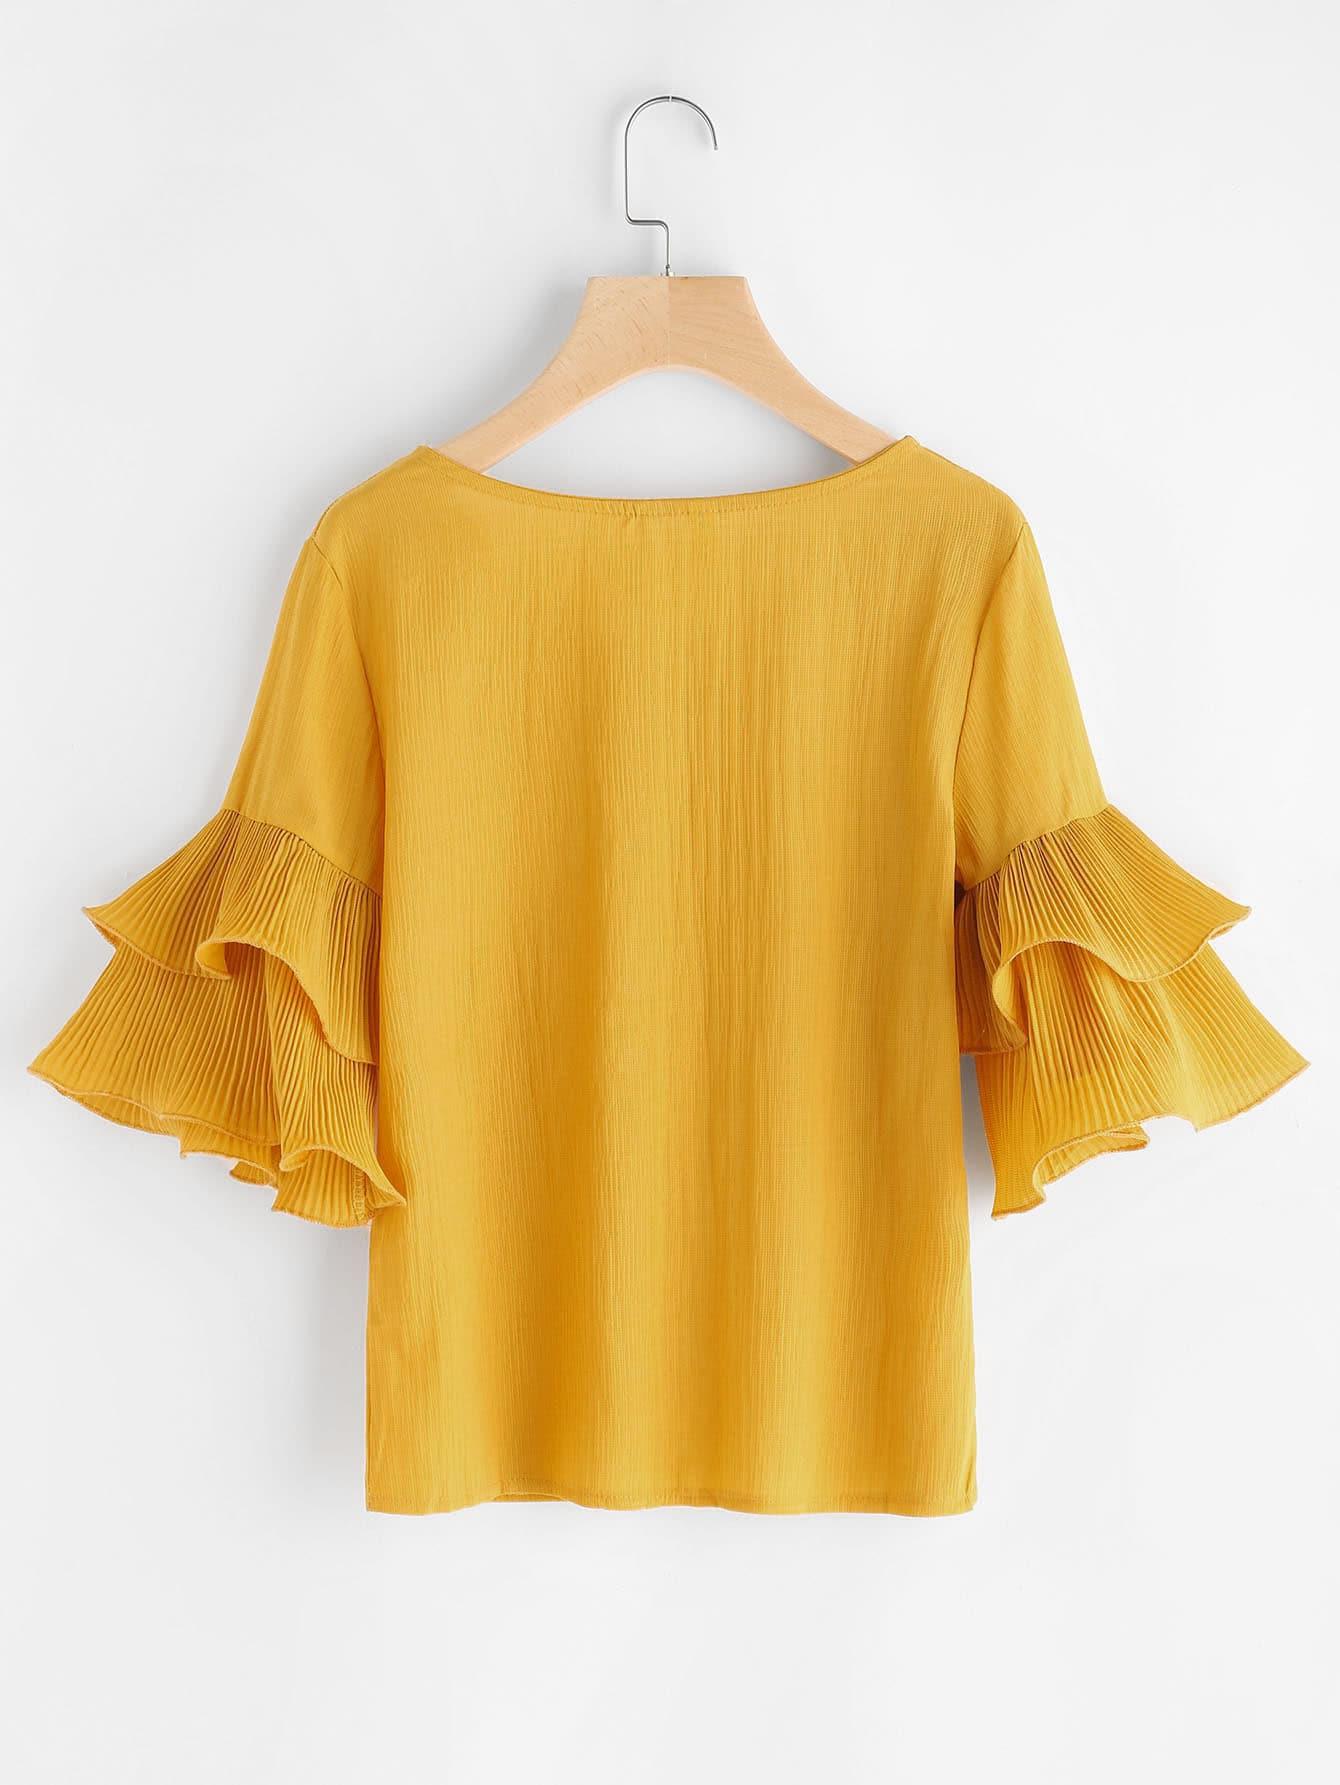 blouse170504105_2